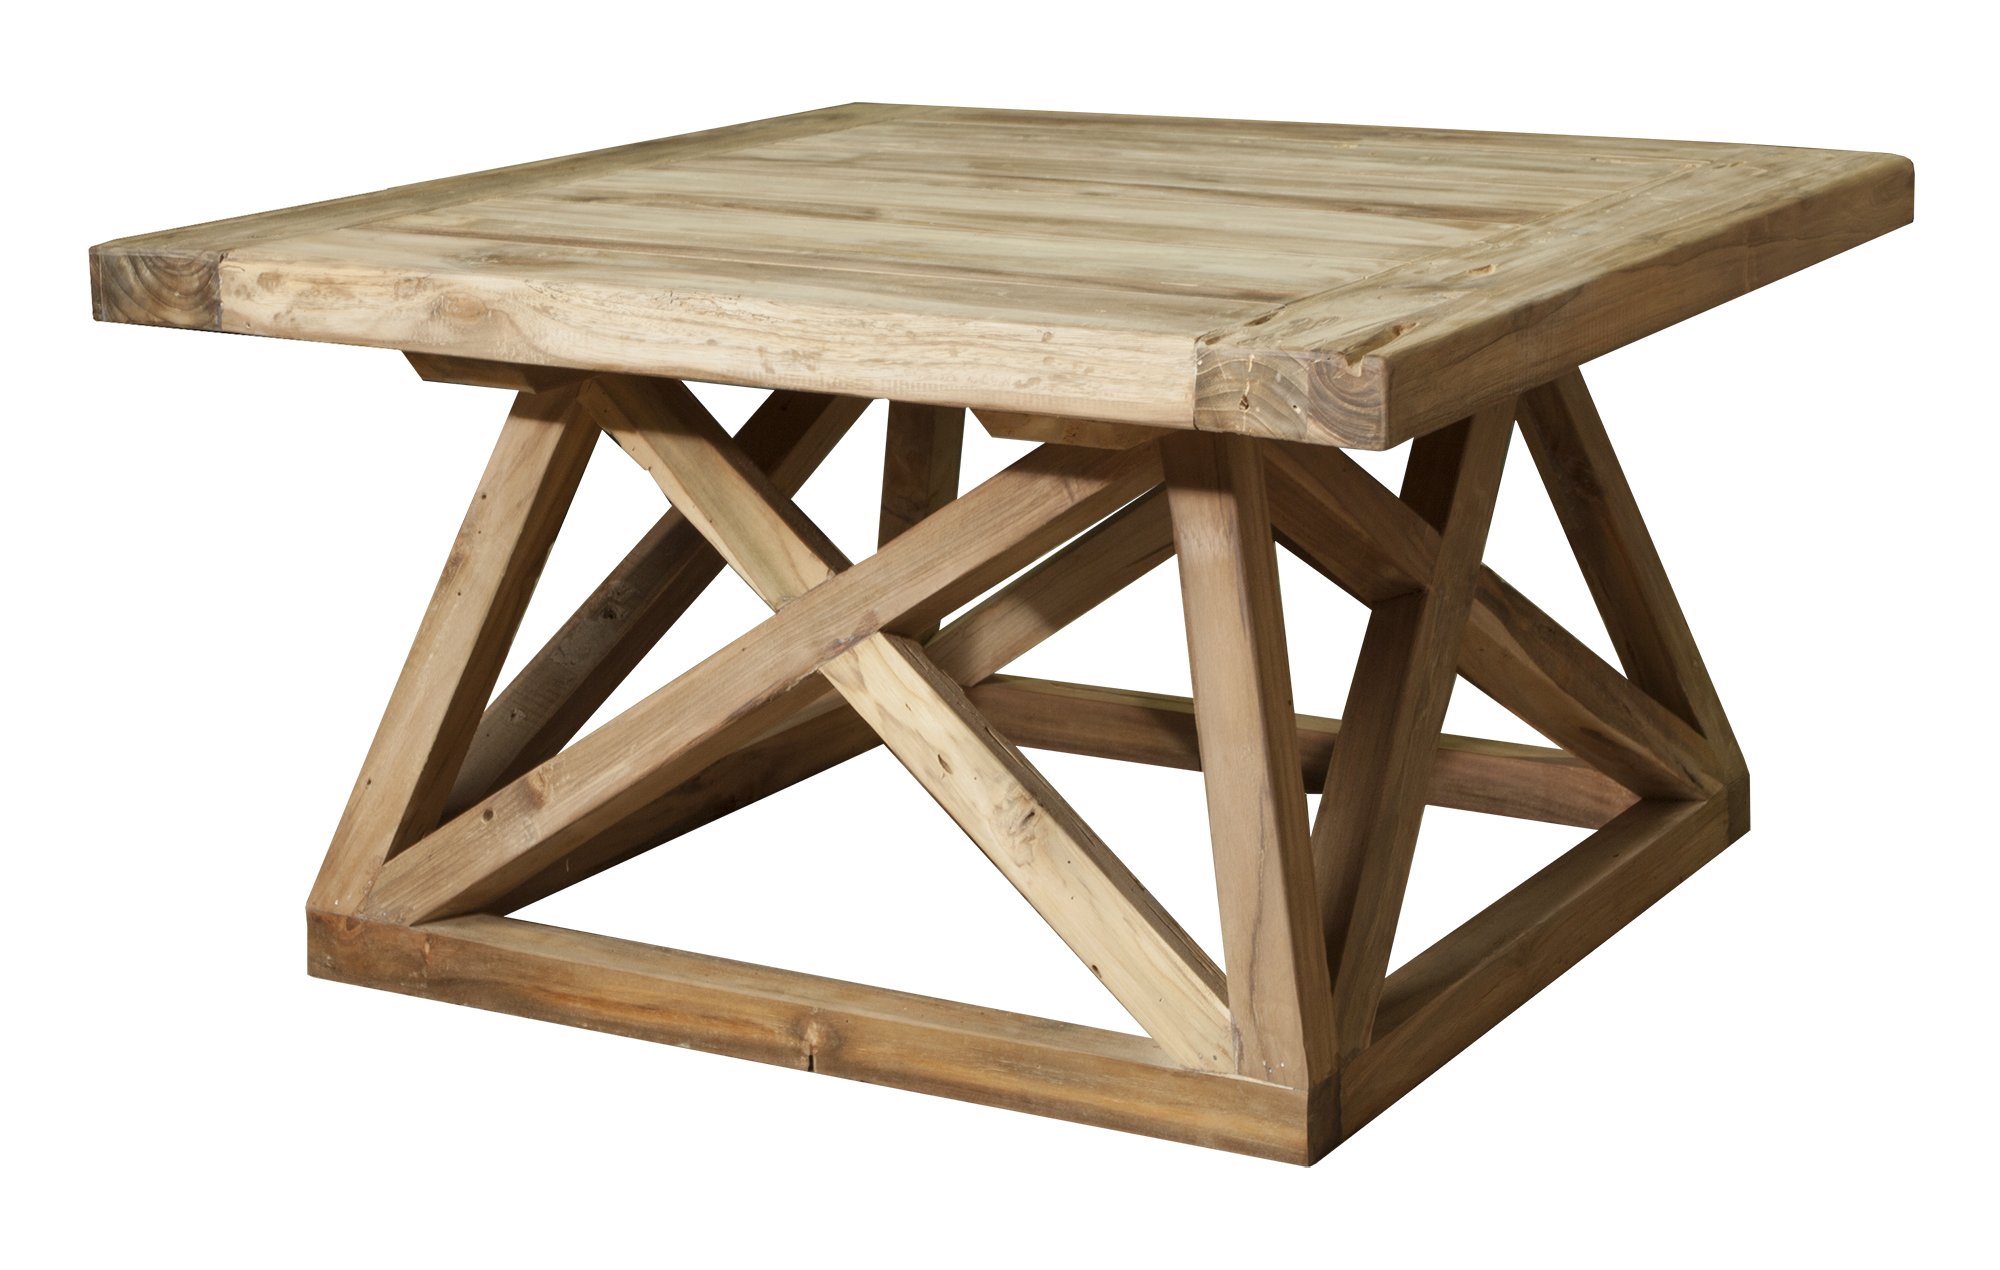 Small furniture end table bridge 80x80 for Table bridge